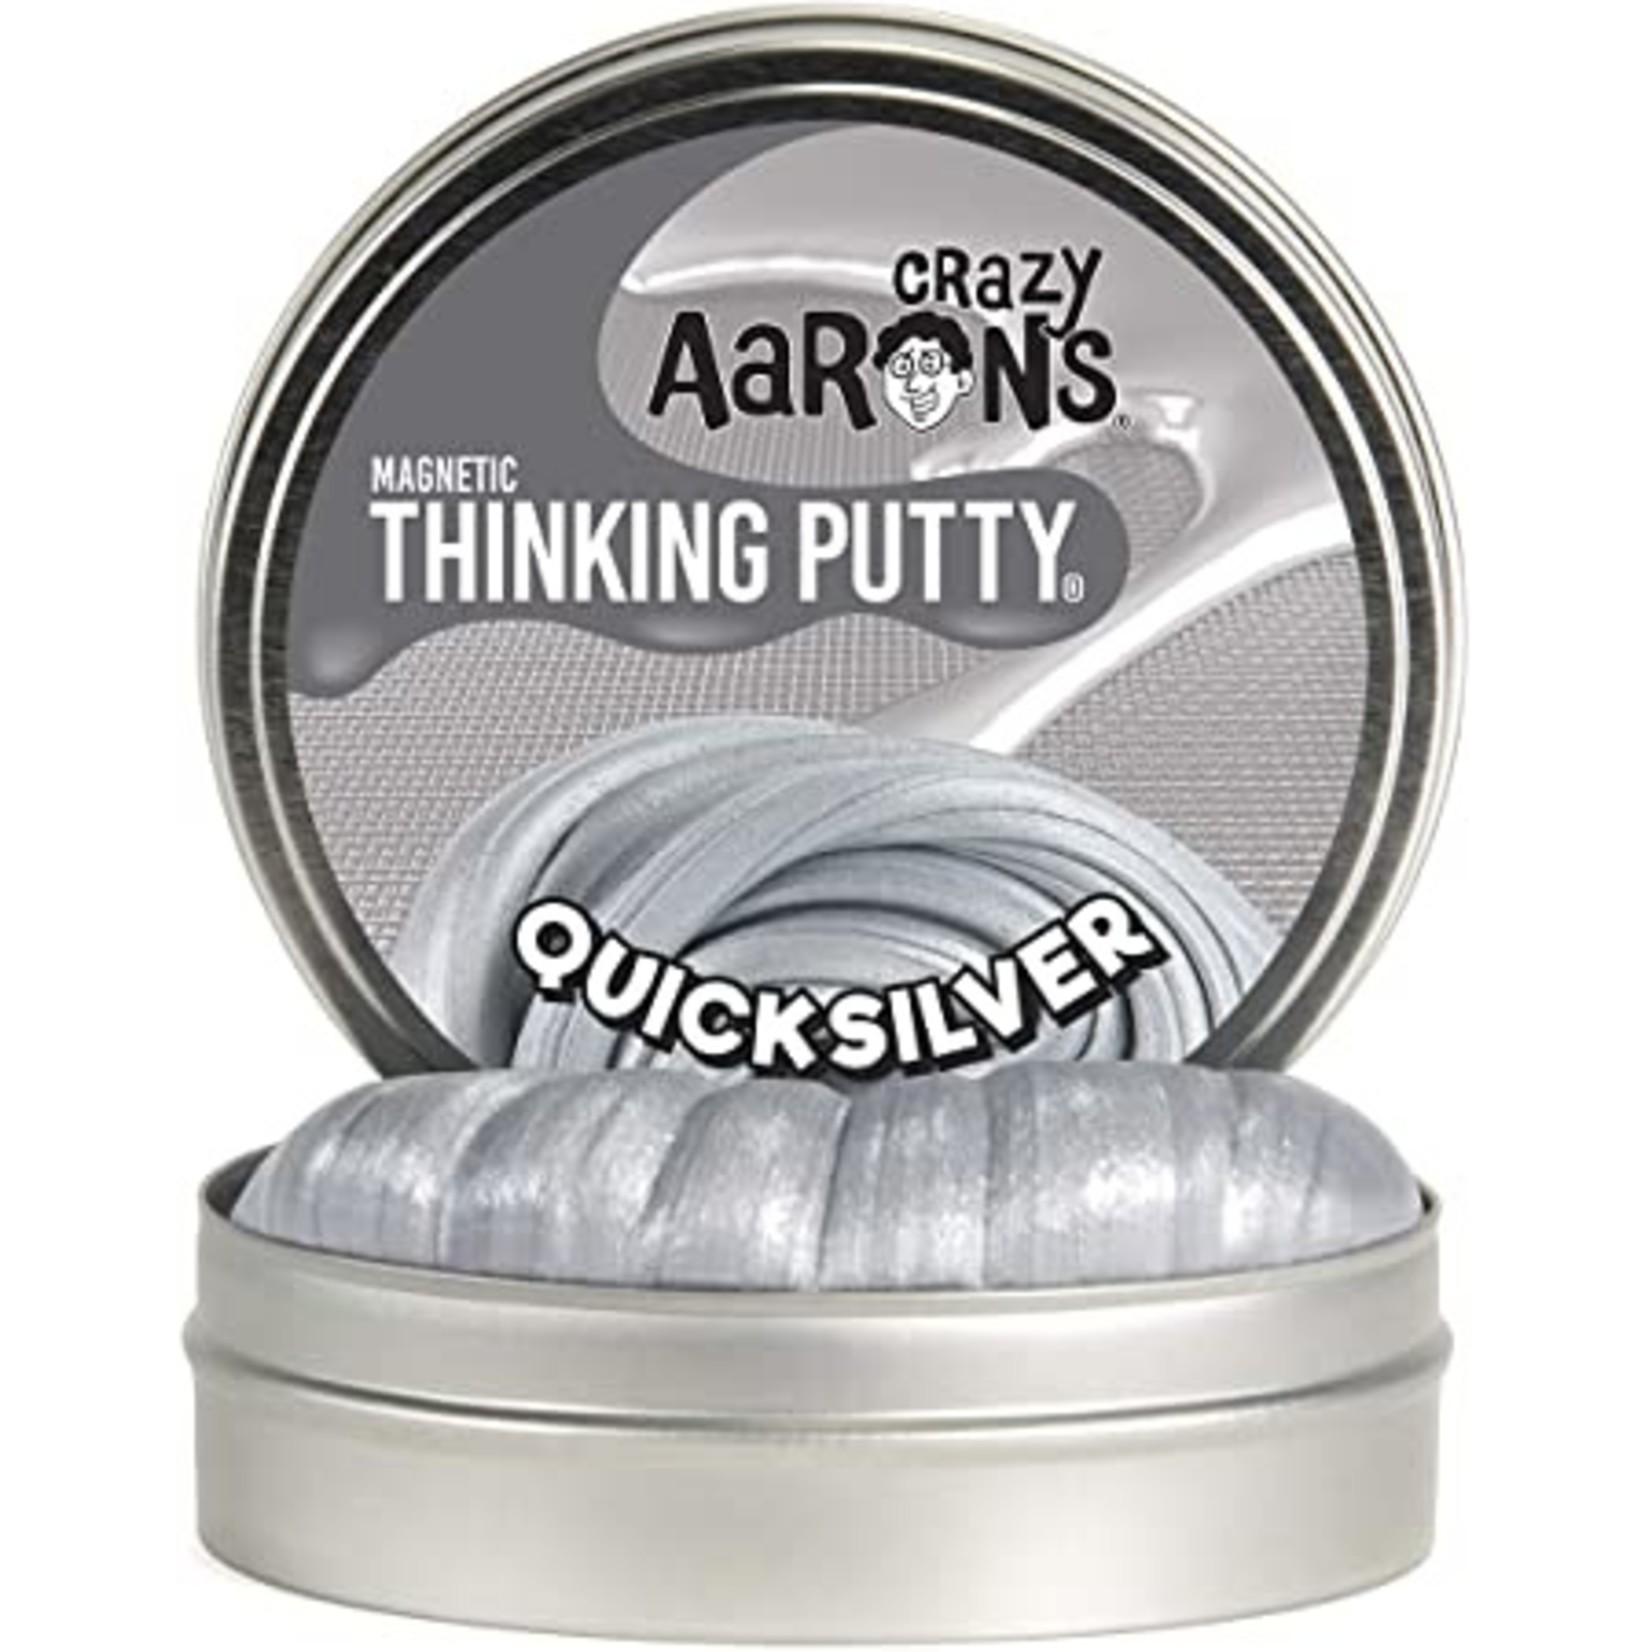 Crazy Aaron's Crazy Aaron's Quicksilver Thinking Putty